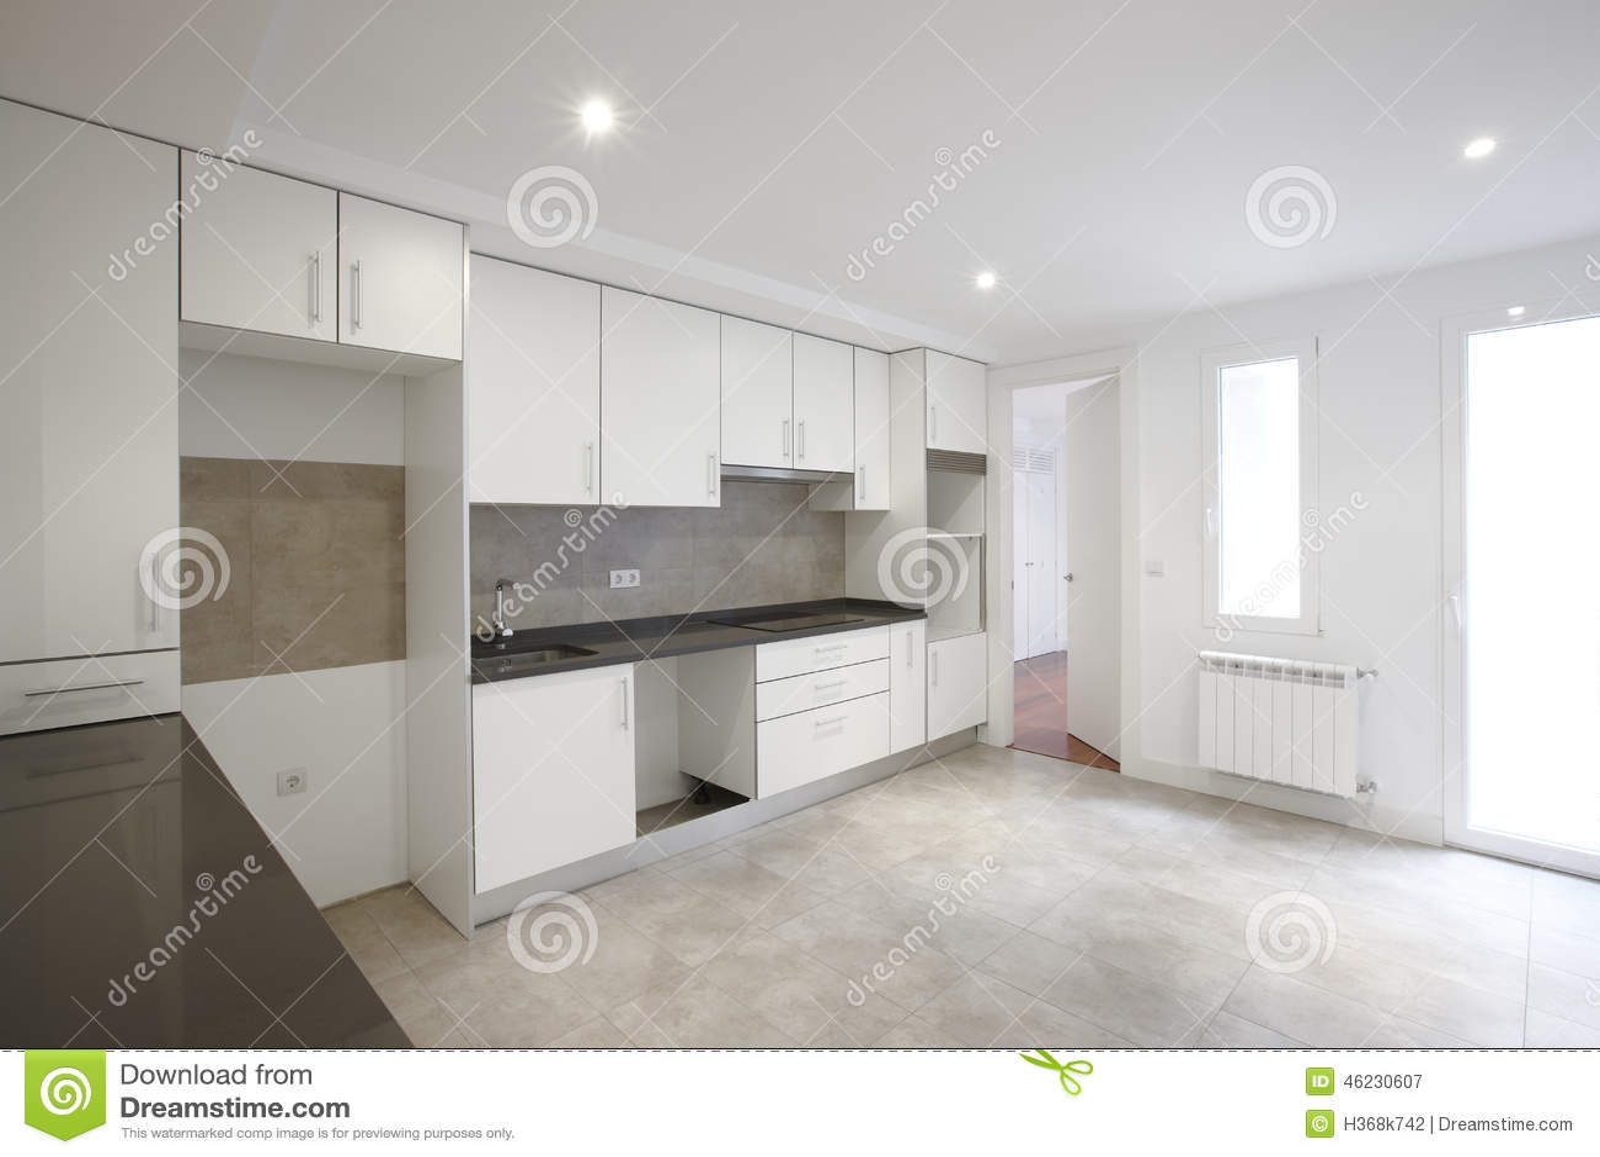 Empty House Kitchen With White Furniture Stock Photo